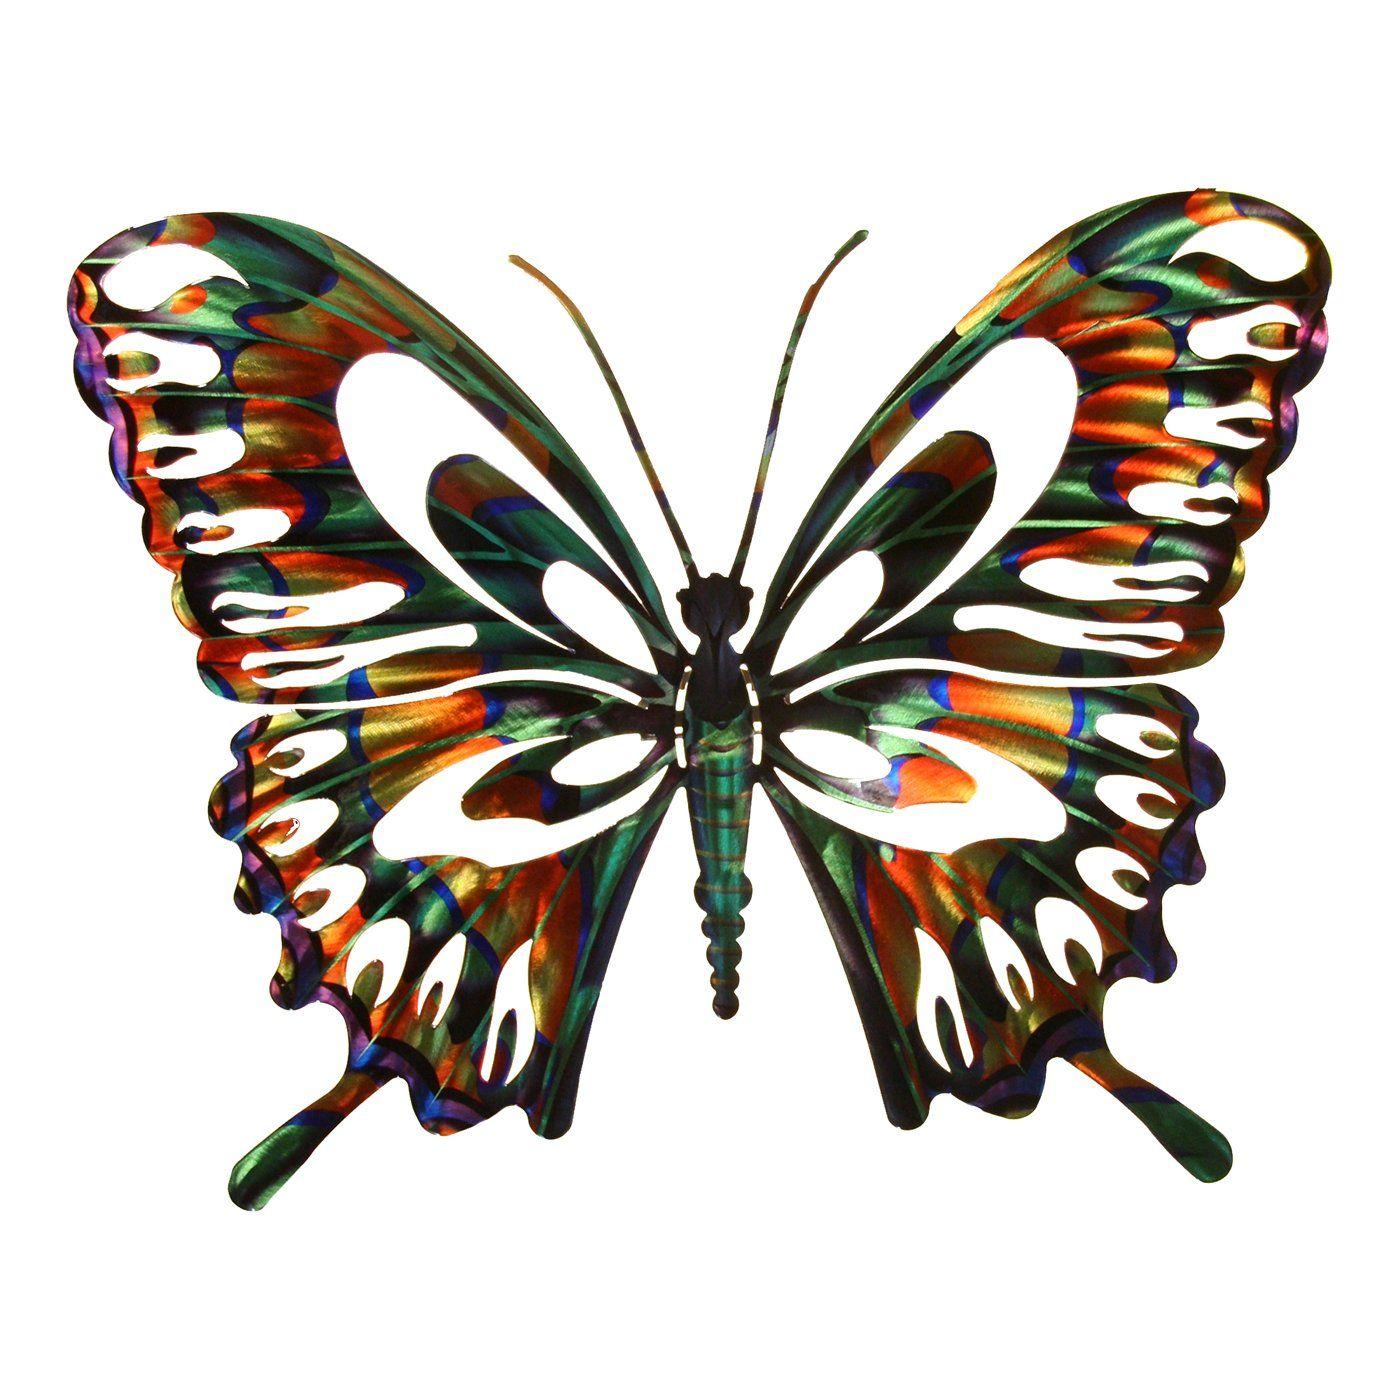 Next innovations wadbflymulti butterfly indooroutdoor metal art